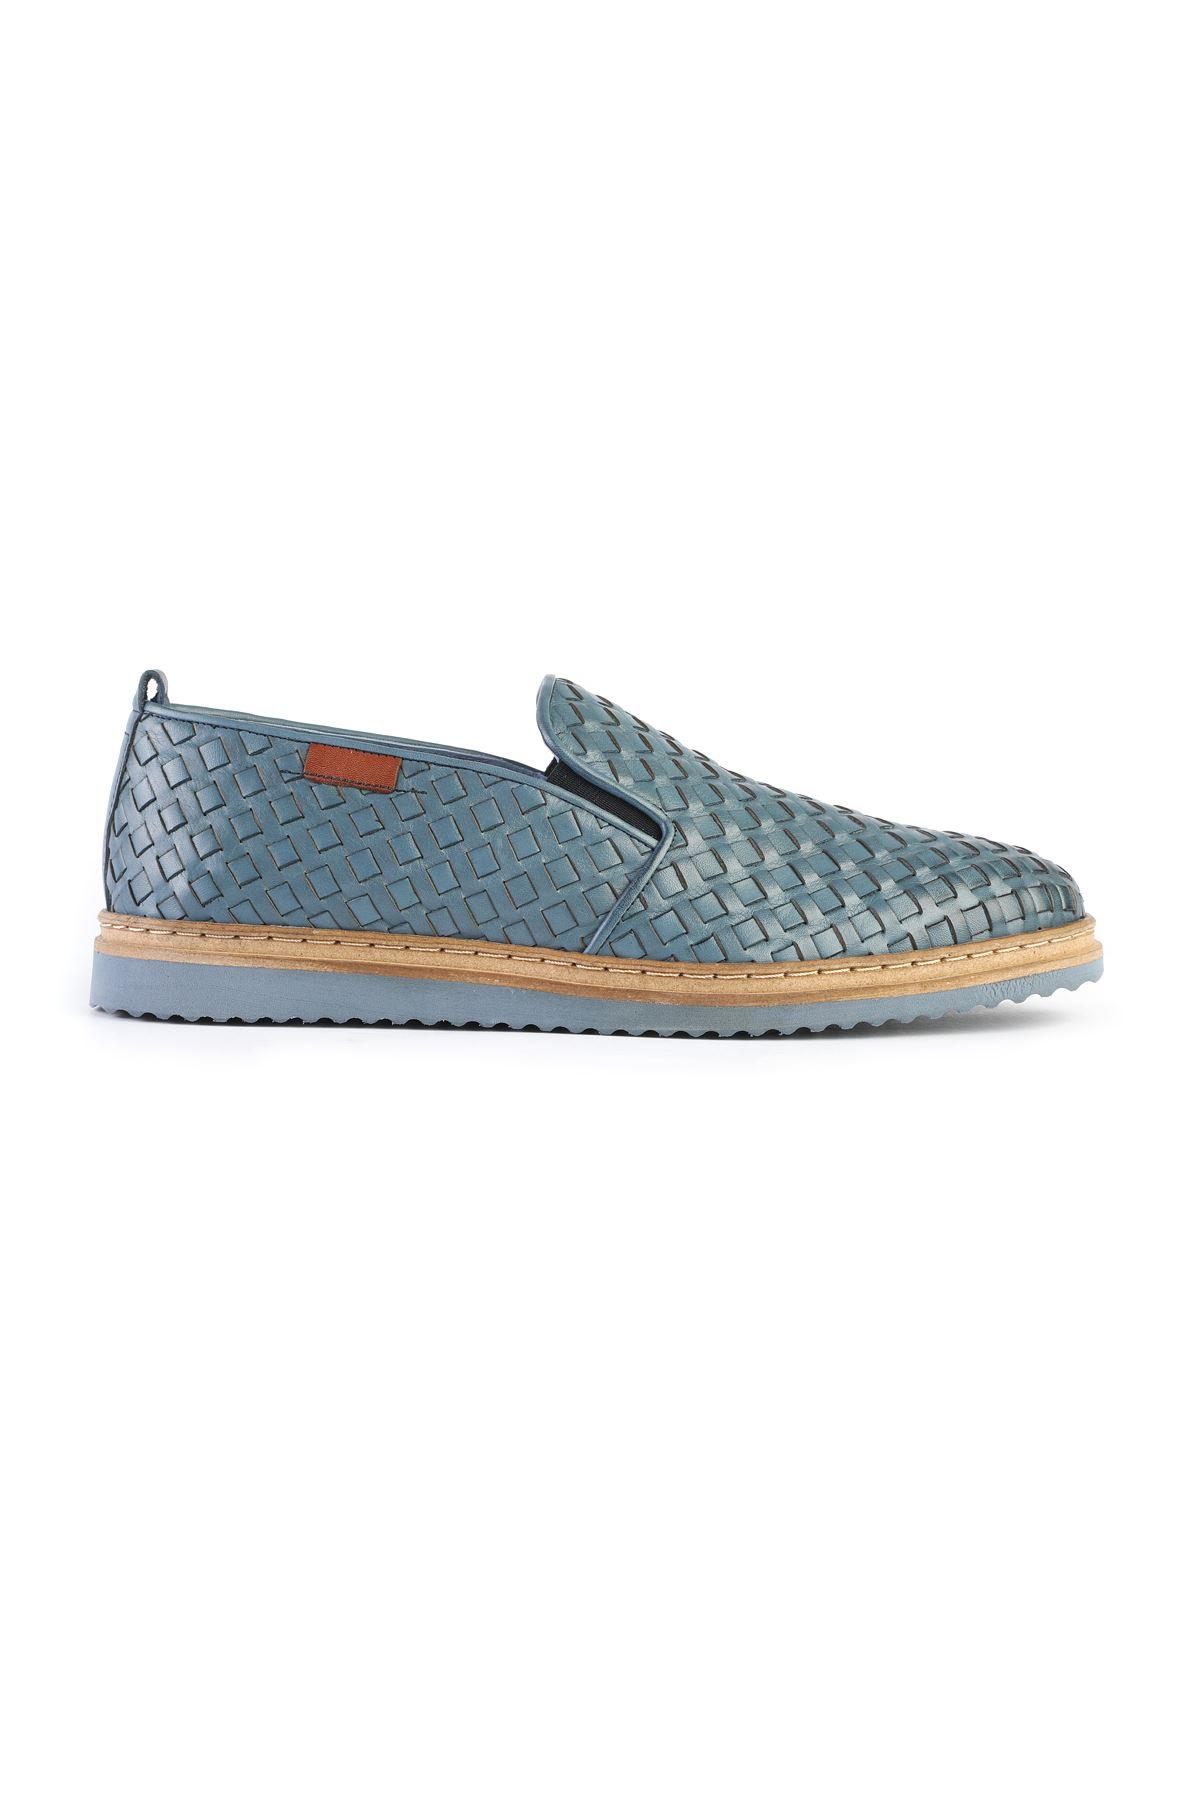 Libero 3295 Blue Loafer Shoes